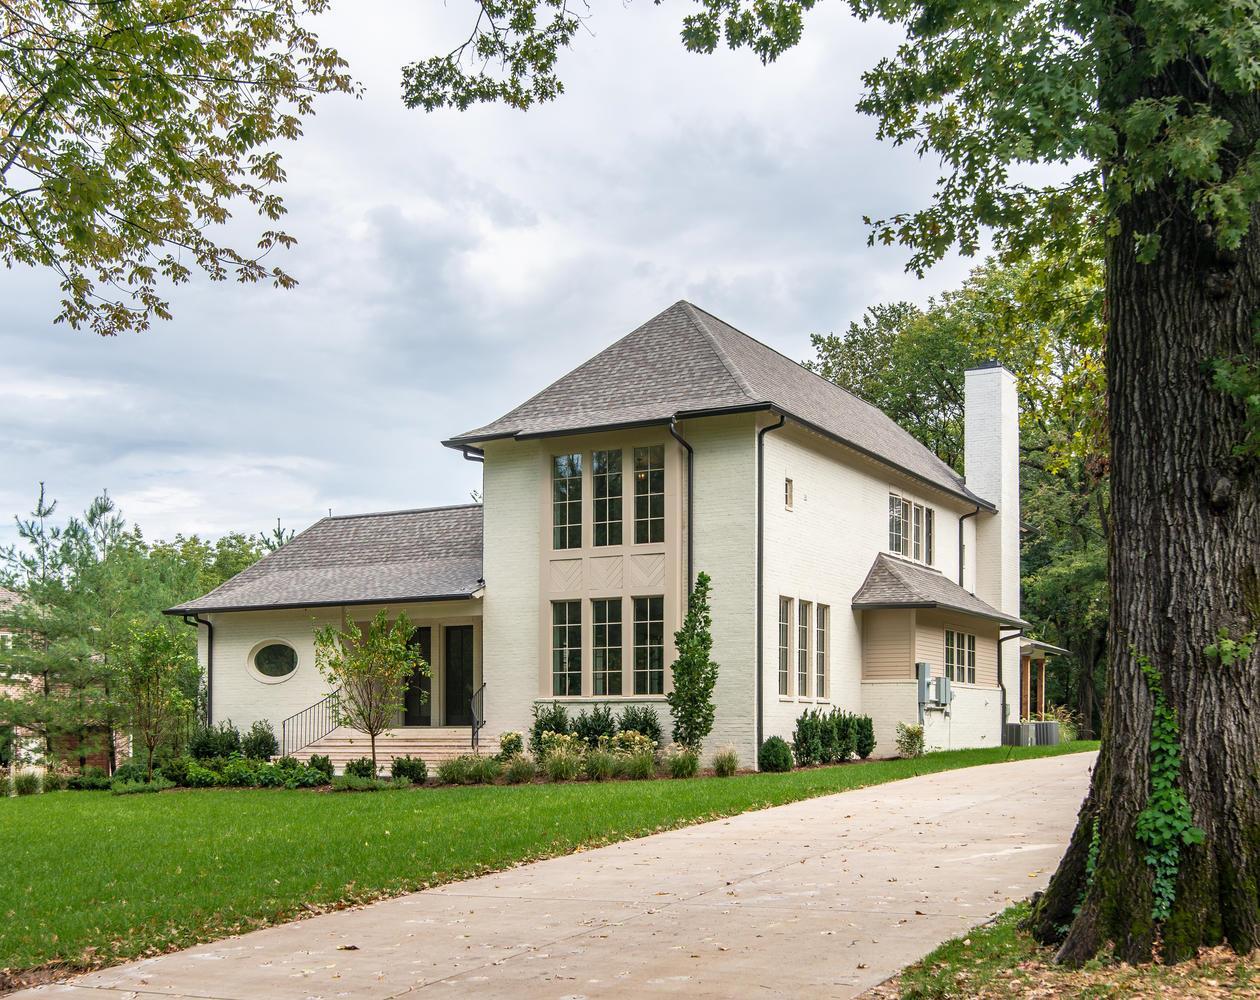 4224 Wallace Lane, Nashville - Green Hills, Tennessee